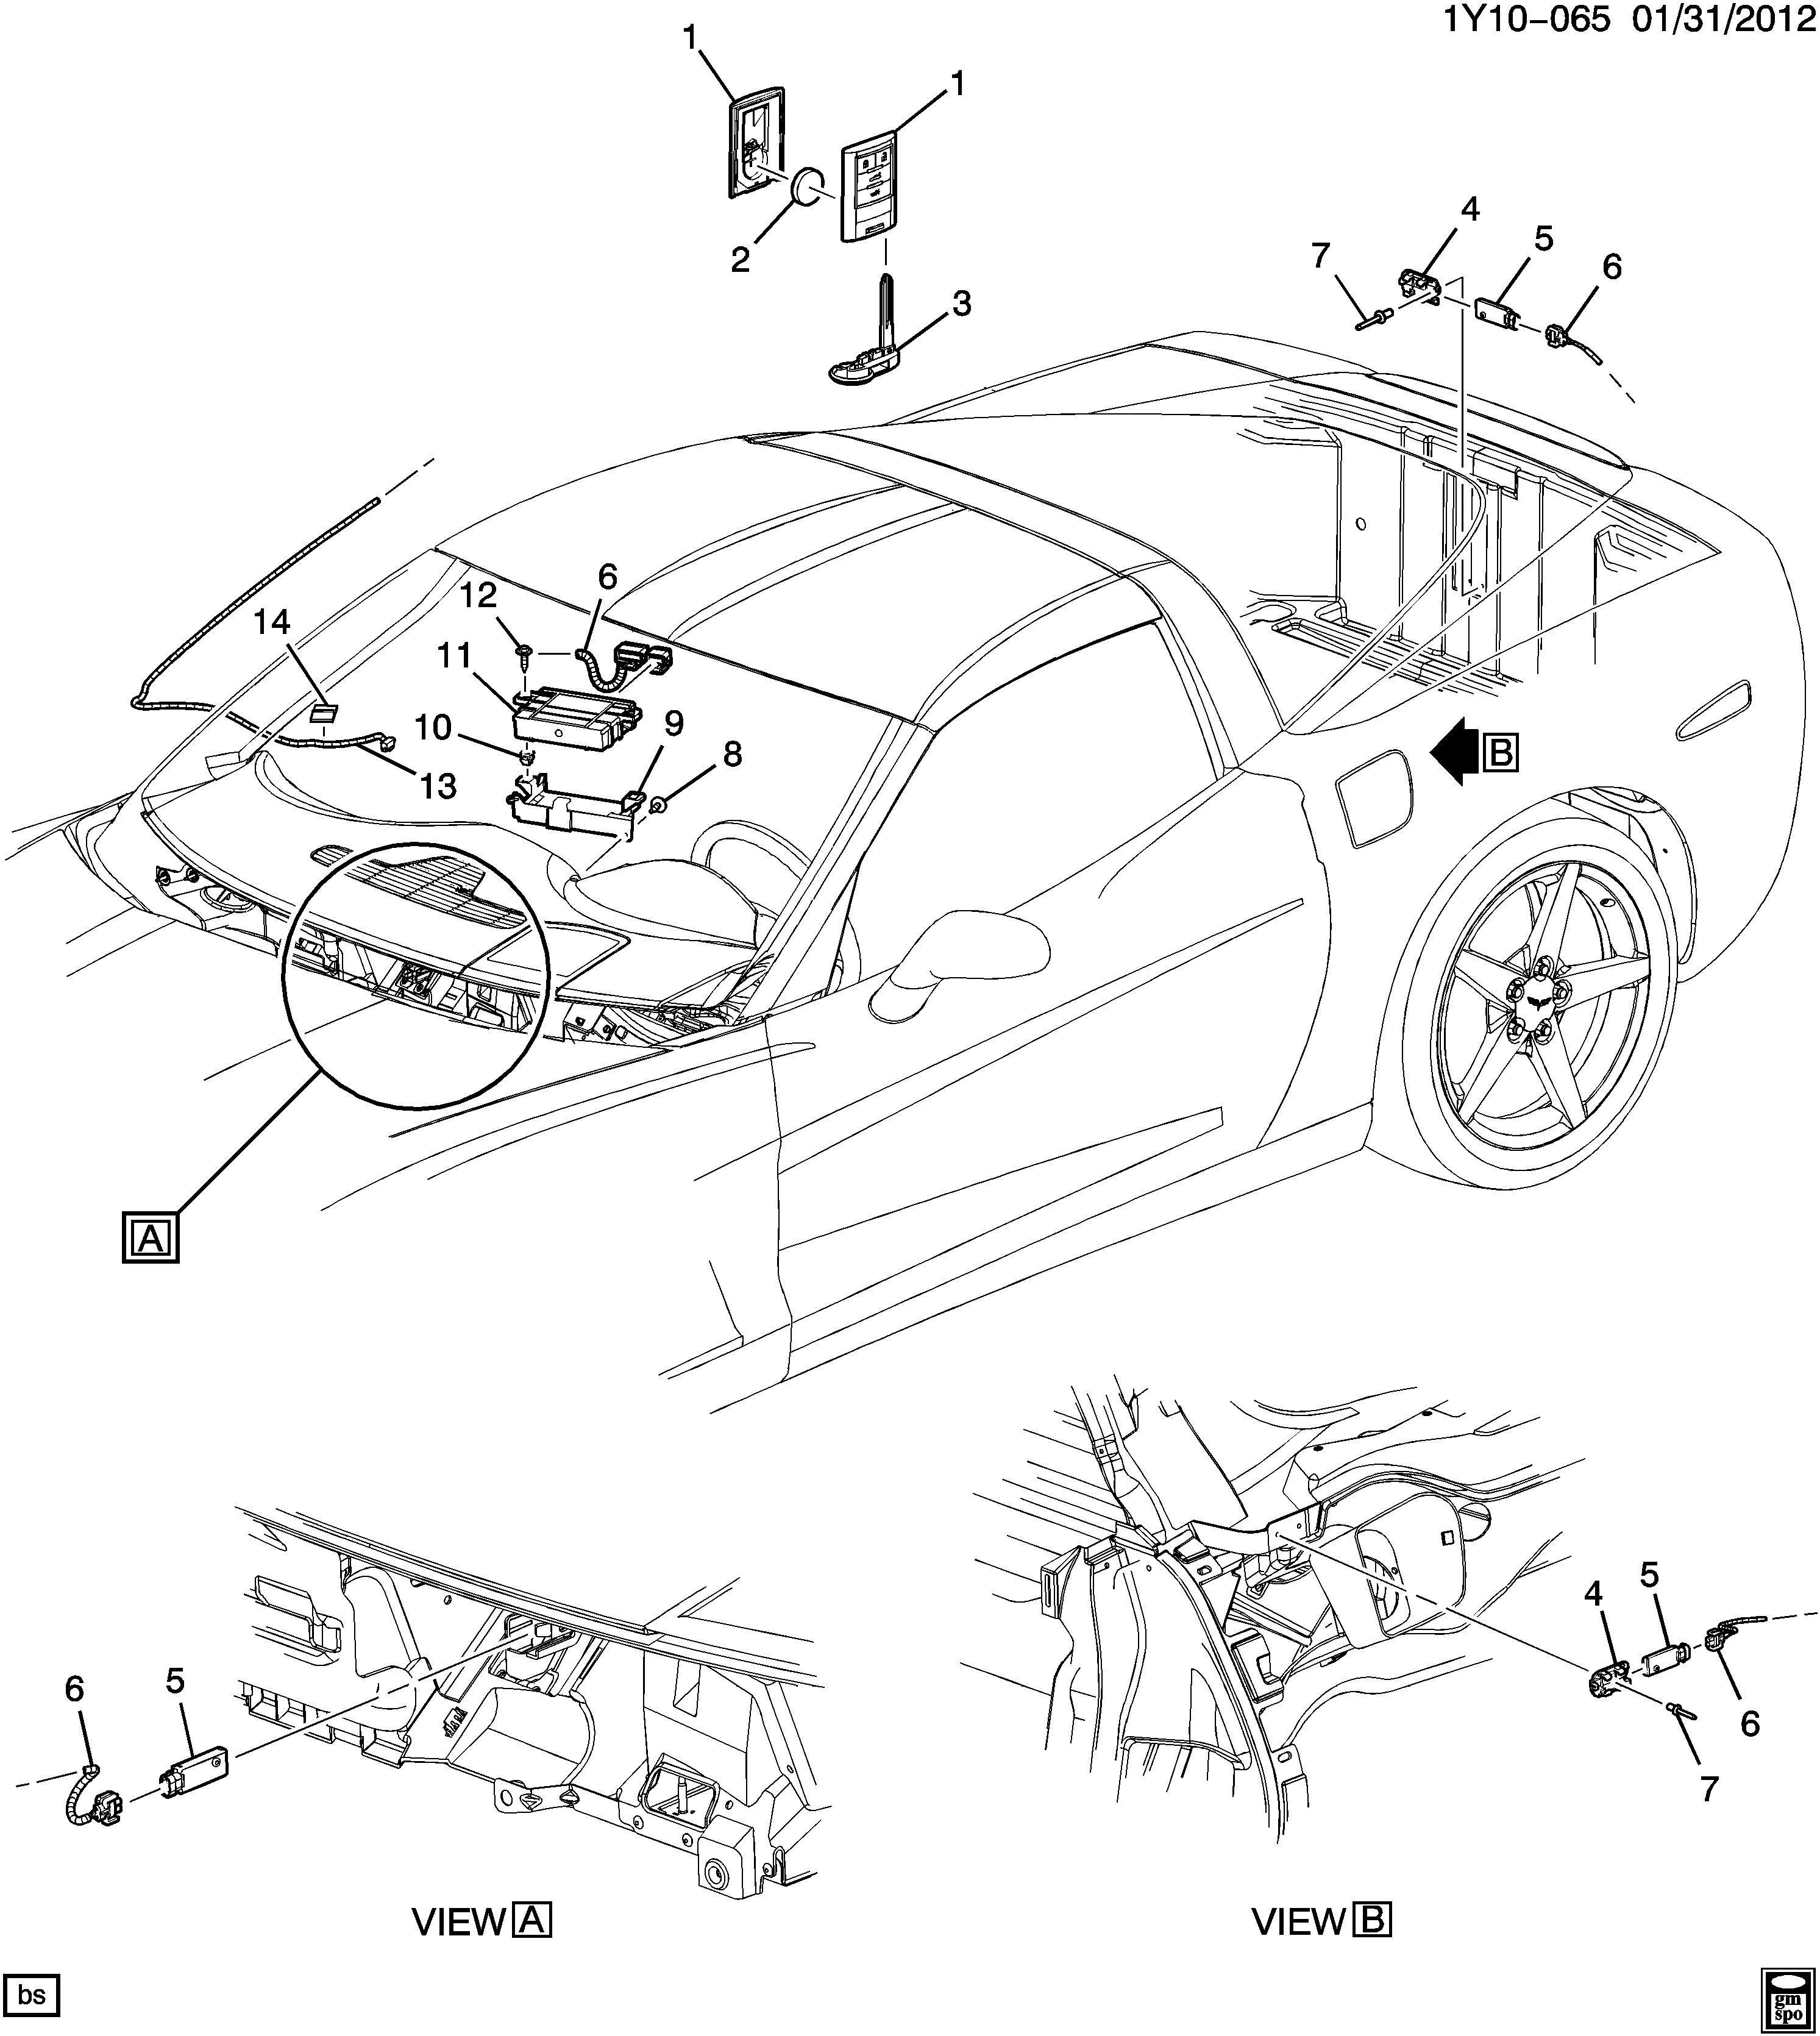 Corvette Entry system keyless remote Chevrolet EPC line